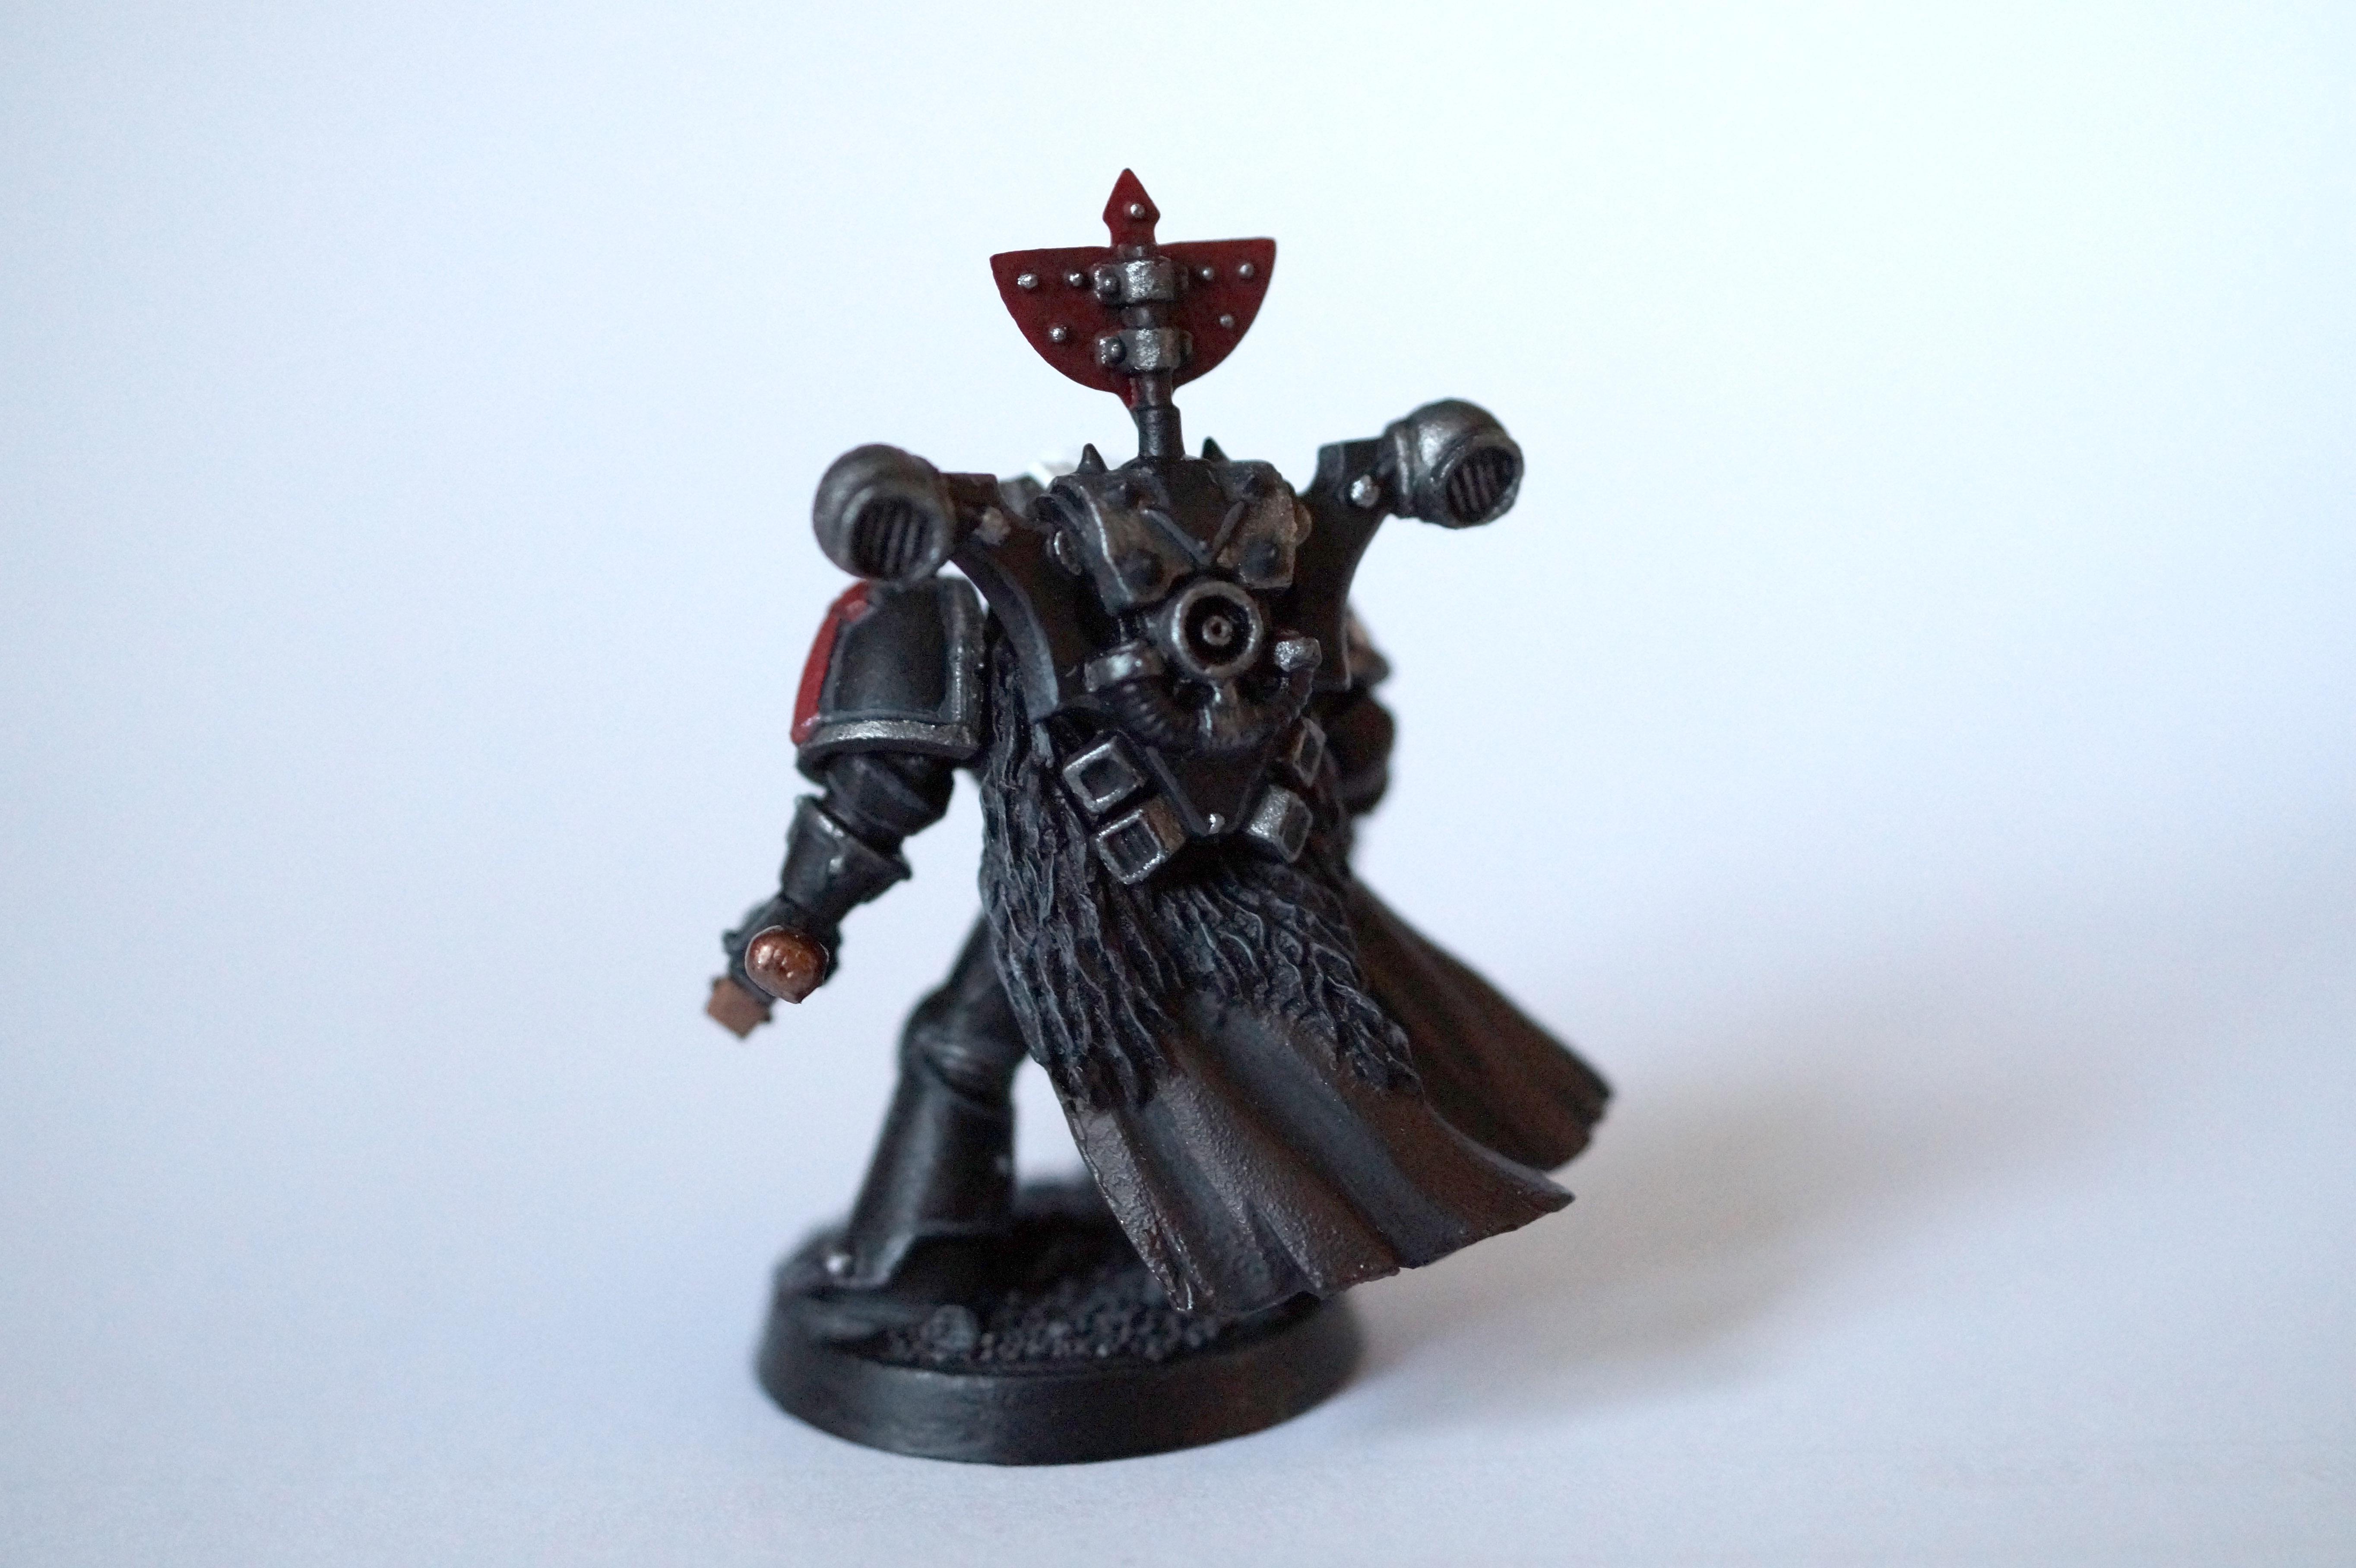 Dark Angels, Fallen Angel, Horus Heresy, Warhammer 40,000